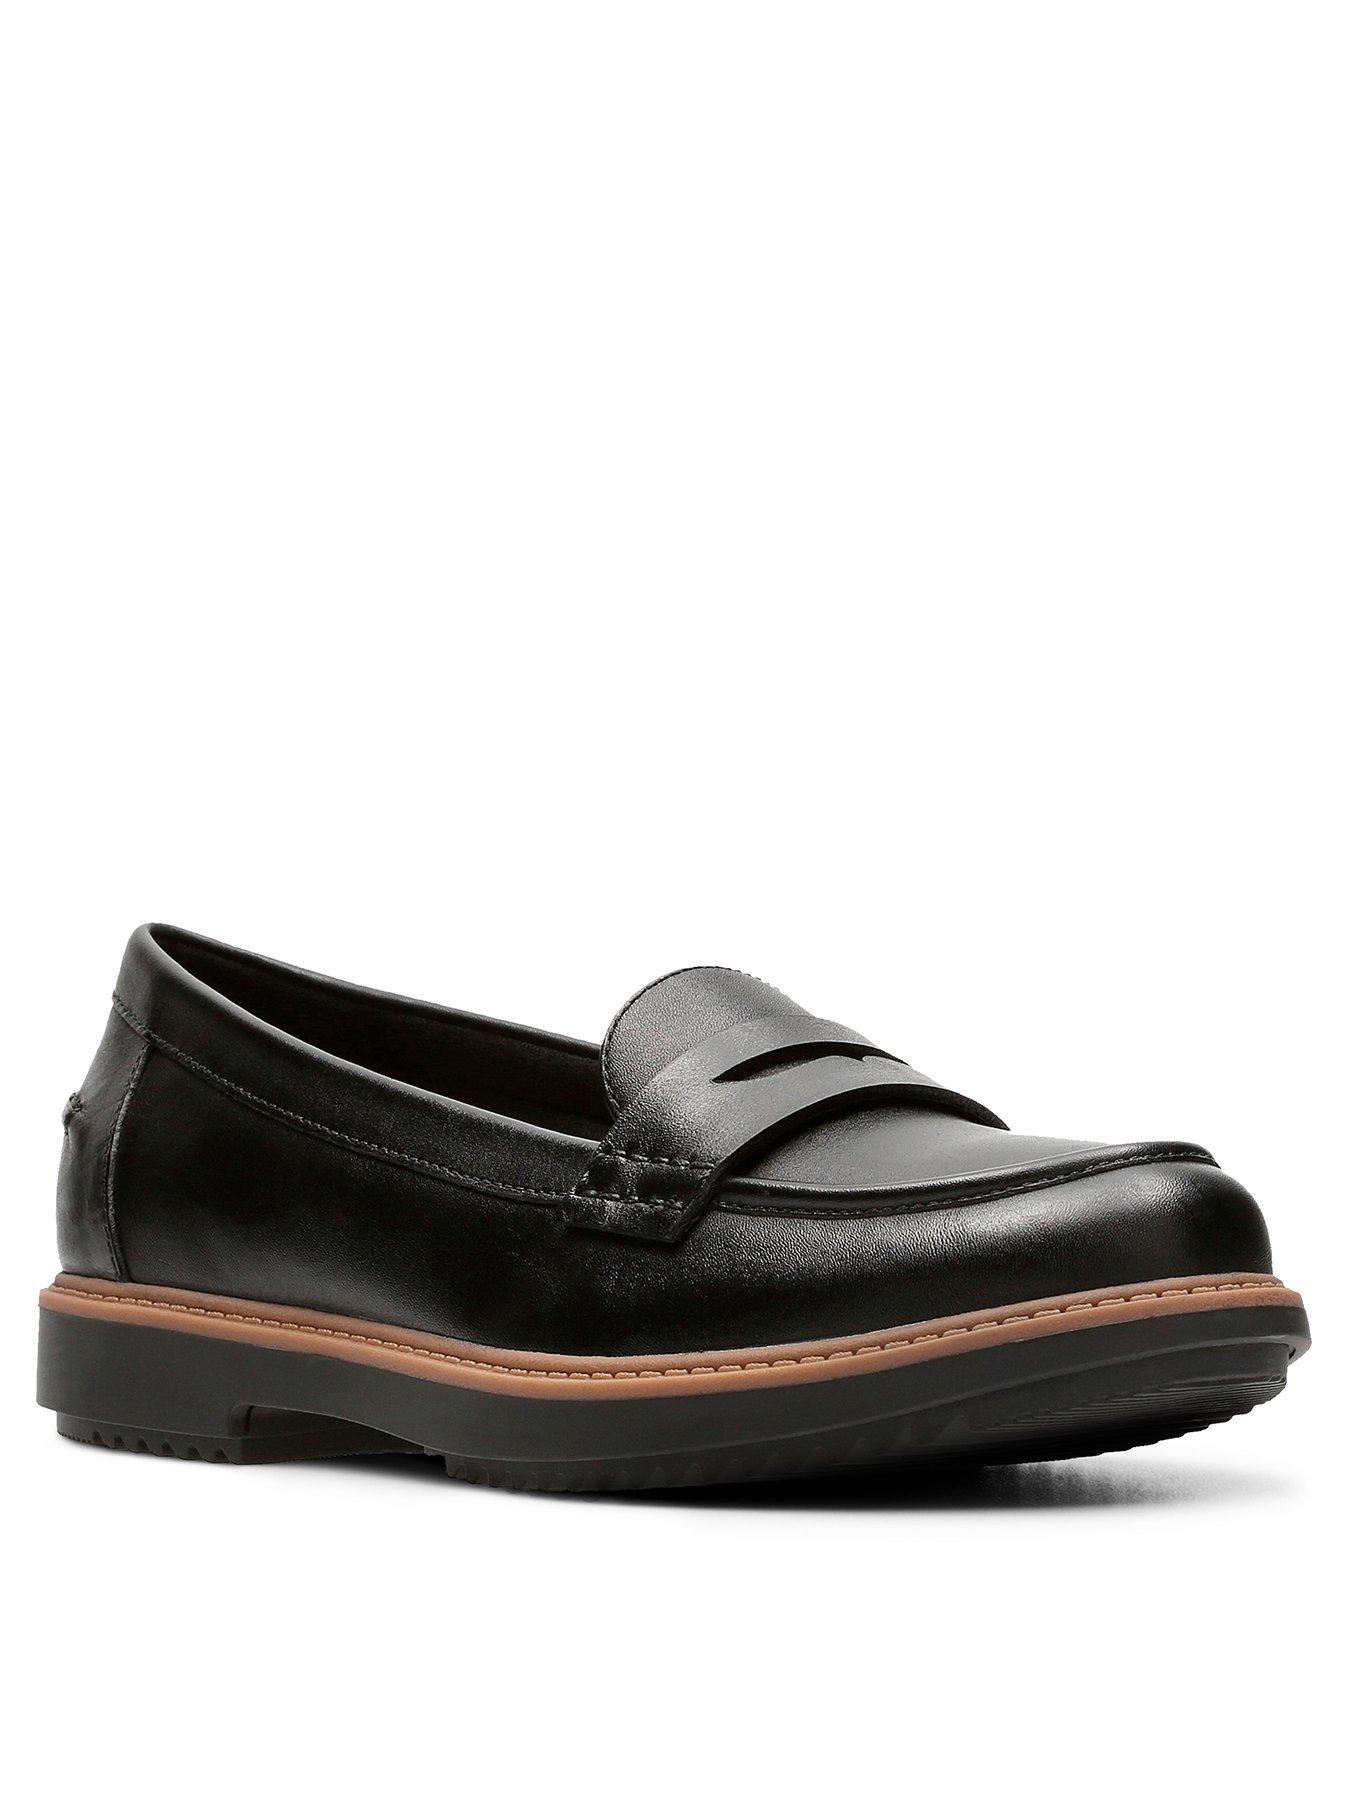 Clarks | Flats | Shoes \u0026 boots | Women